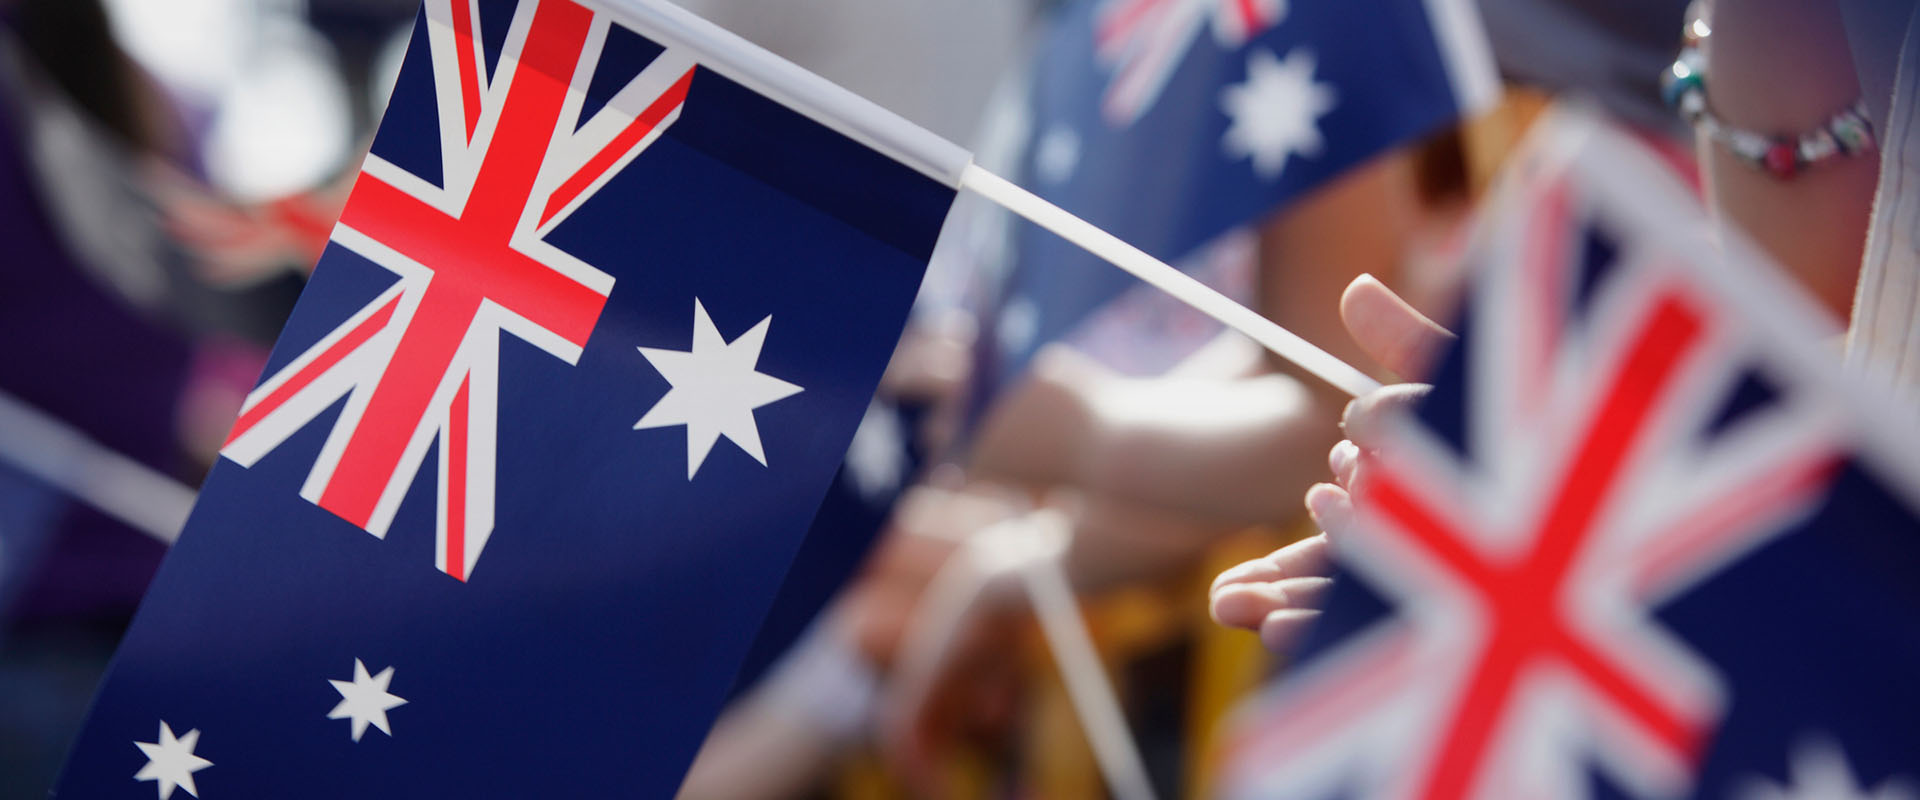 australiaday02